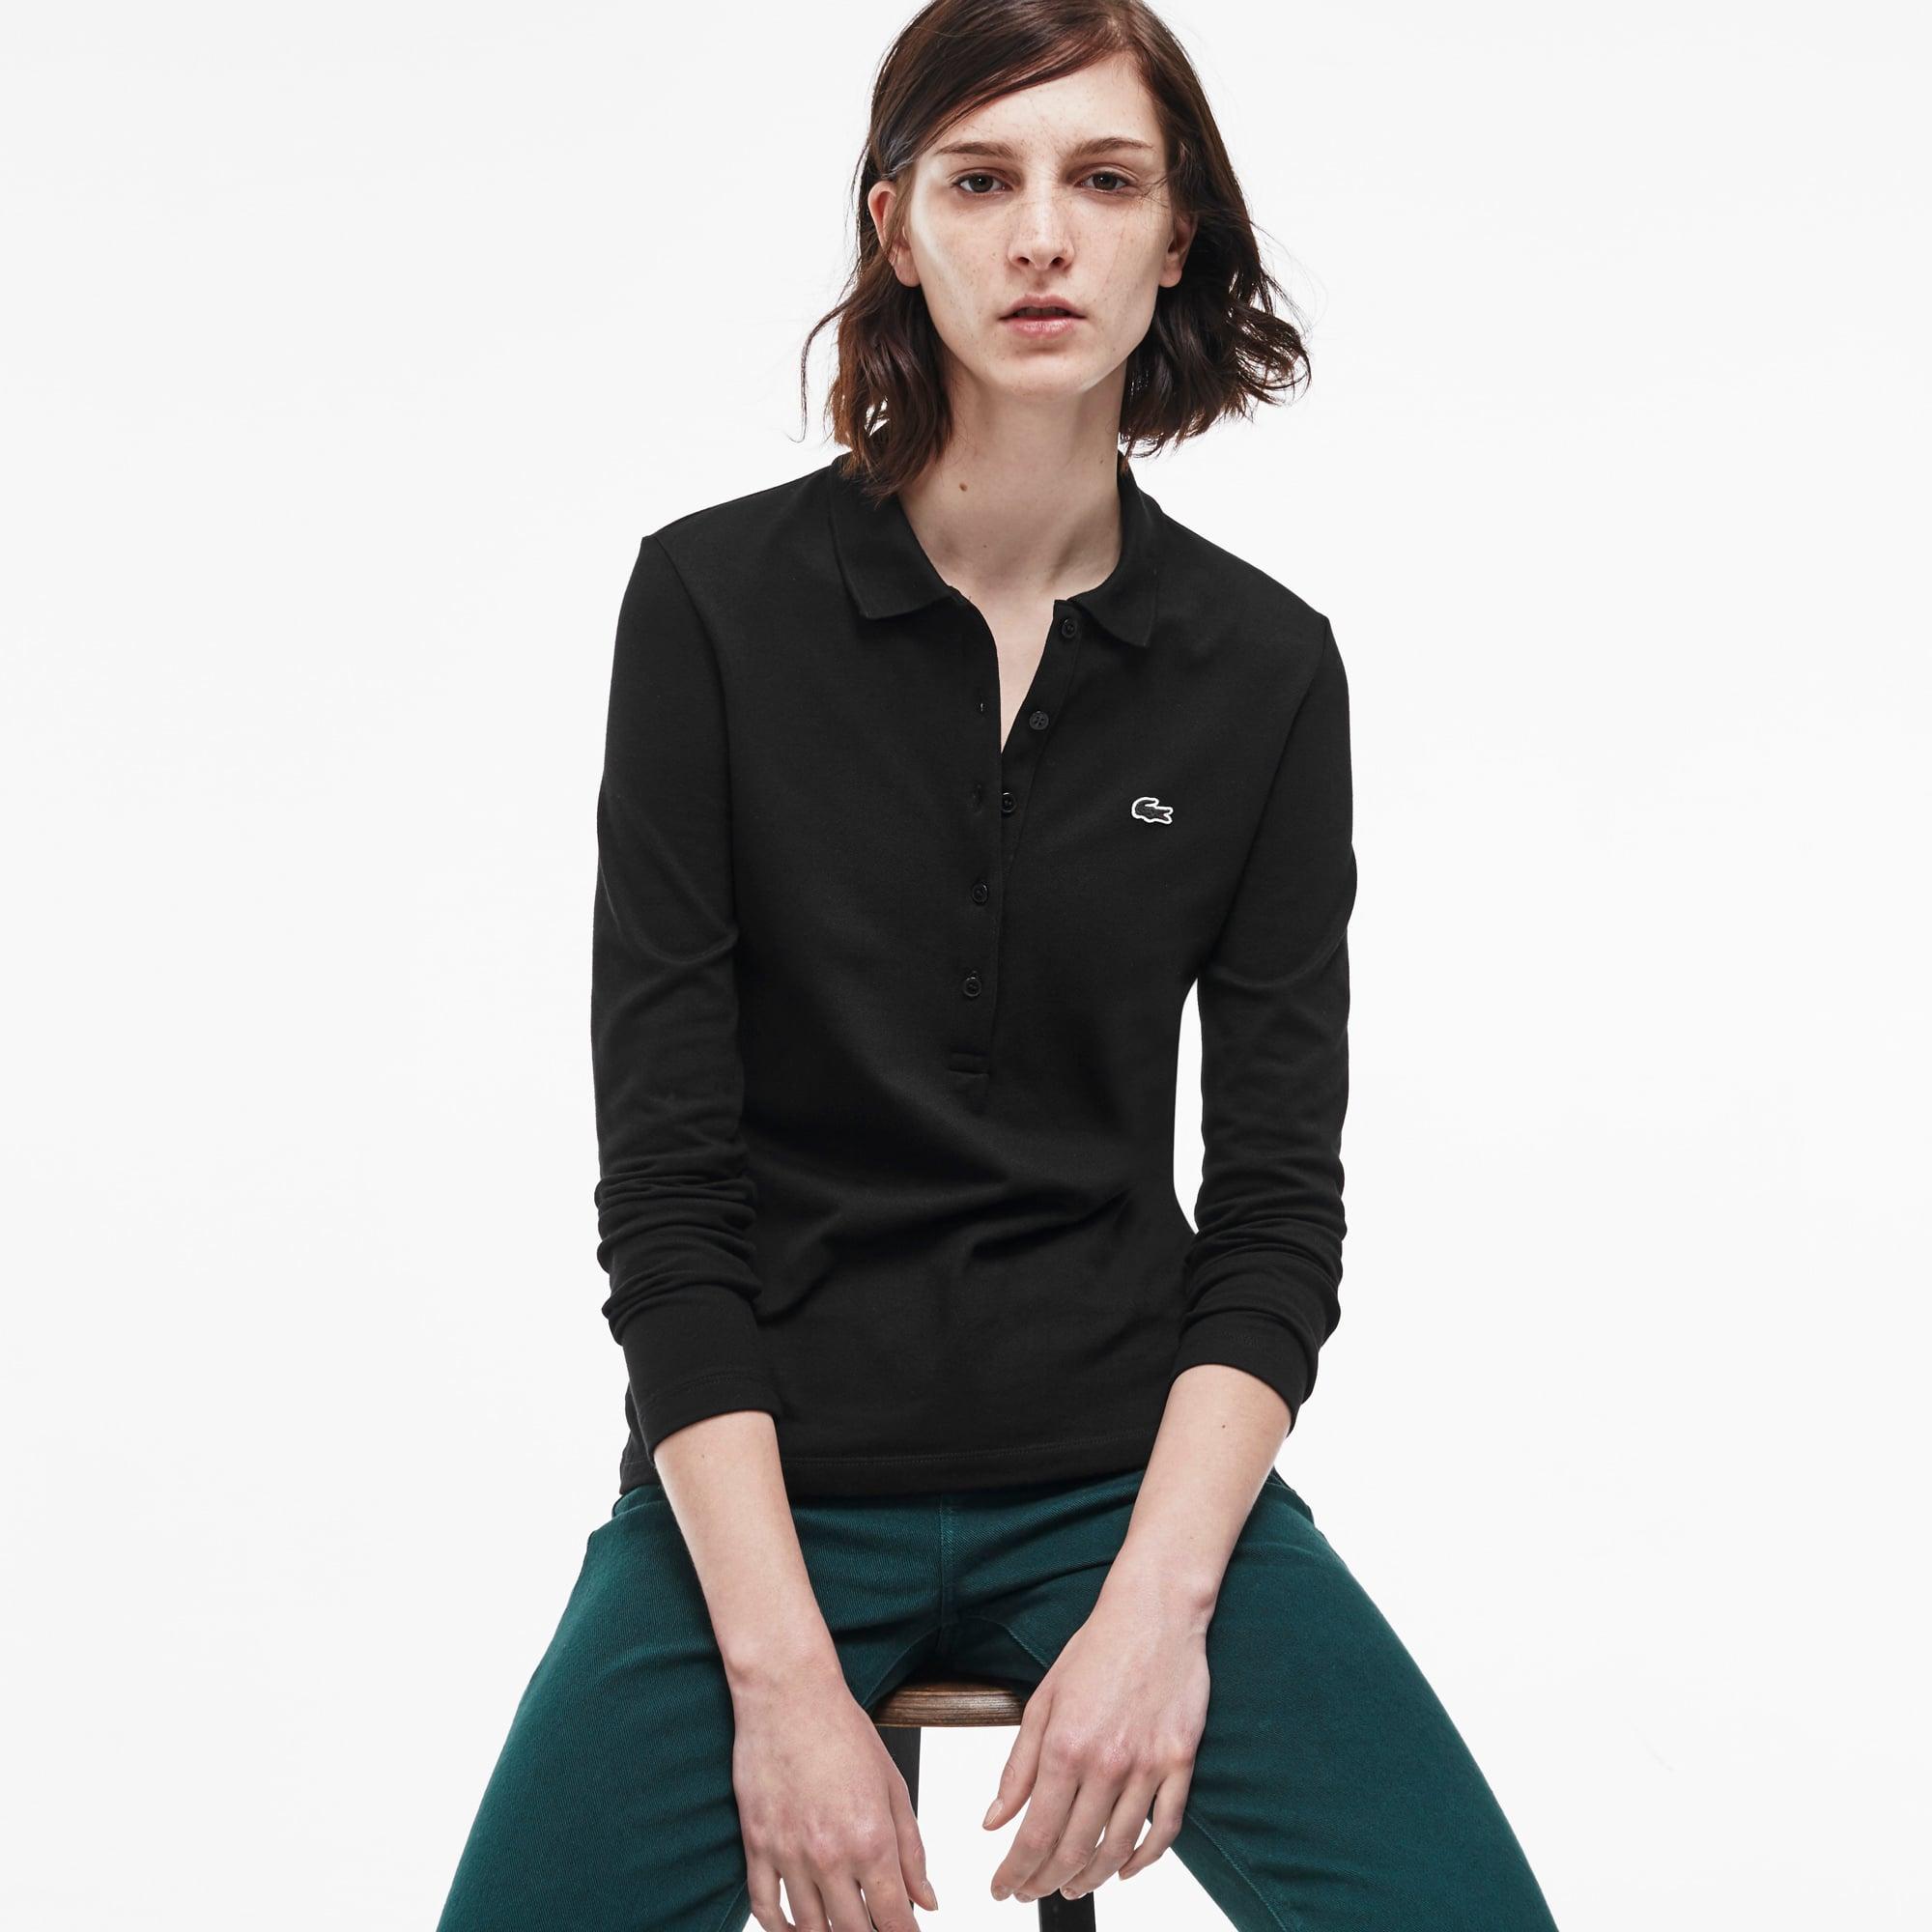 Women's Stretch Piqué Polo Shirt